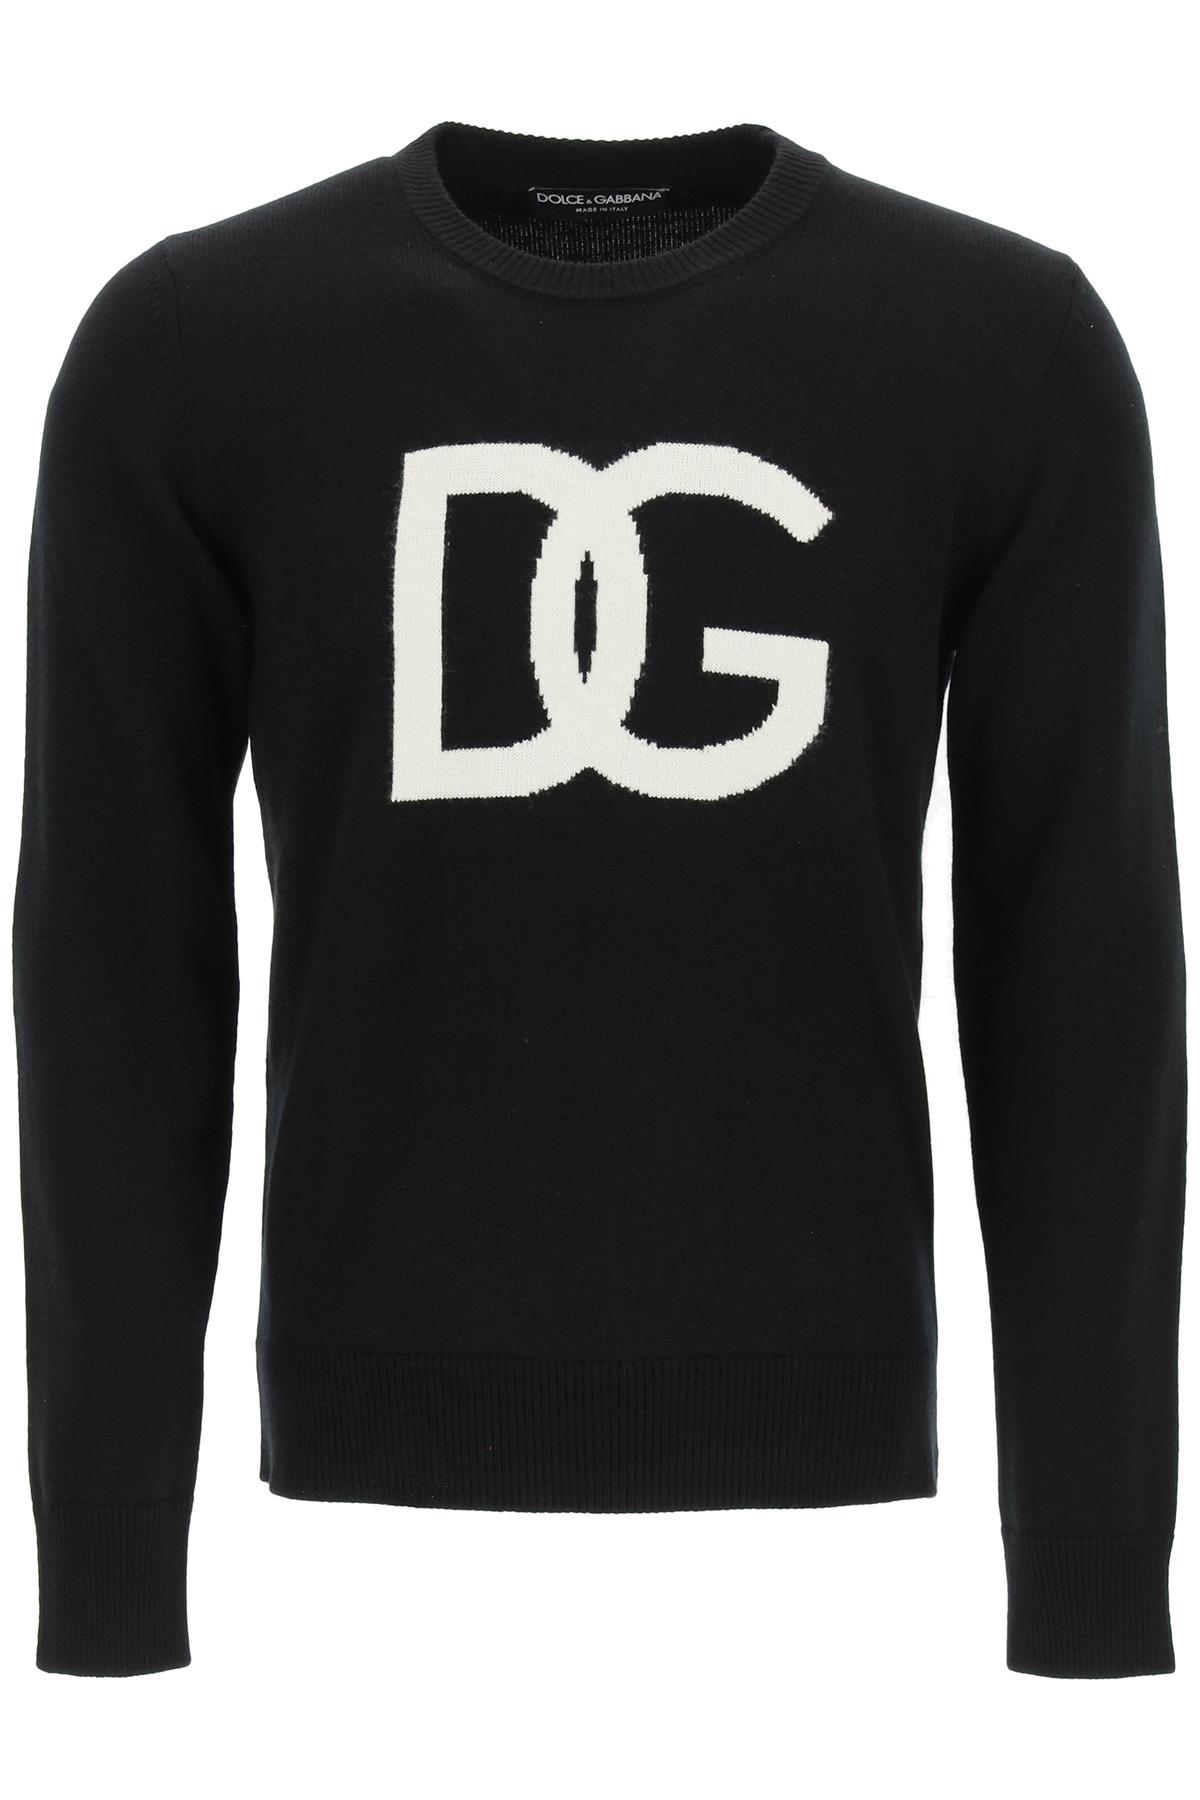 Dolce & gabbana pullover intarsio logo dg